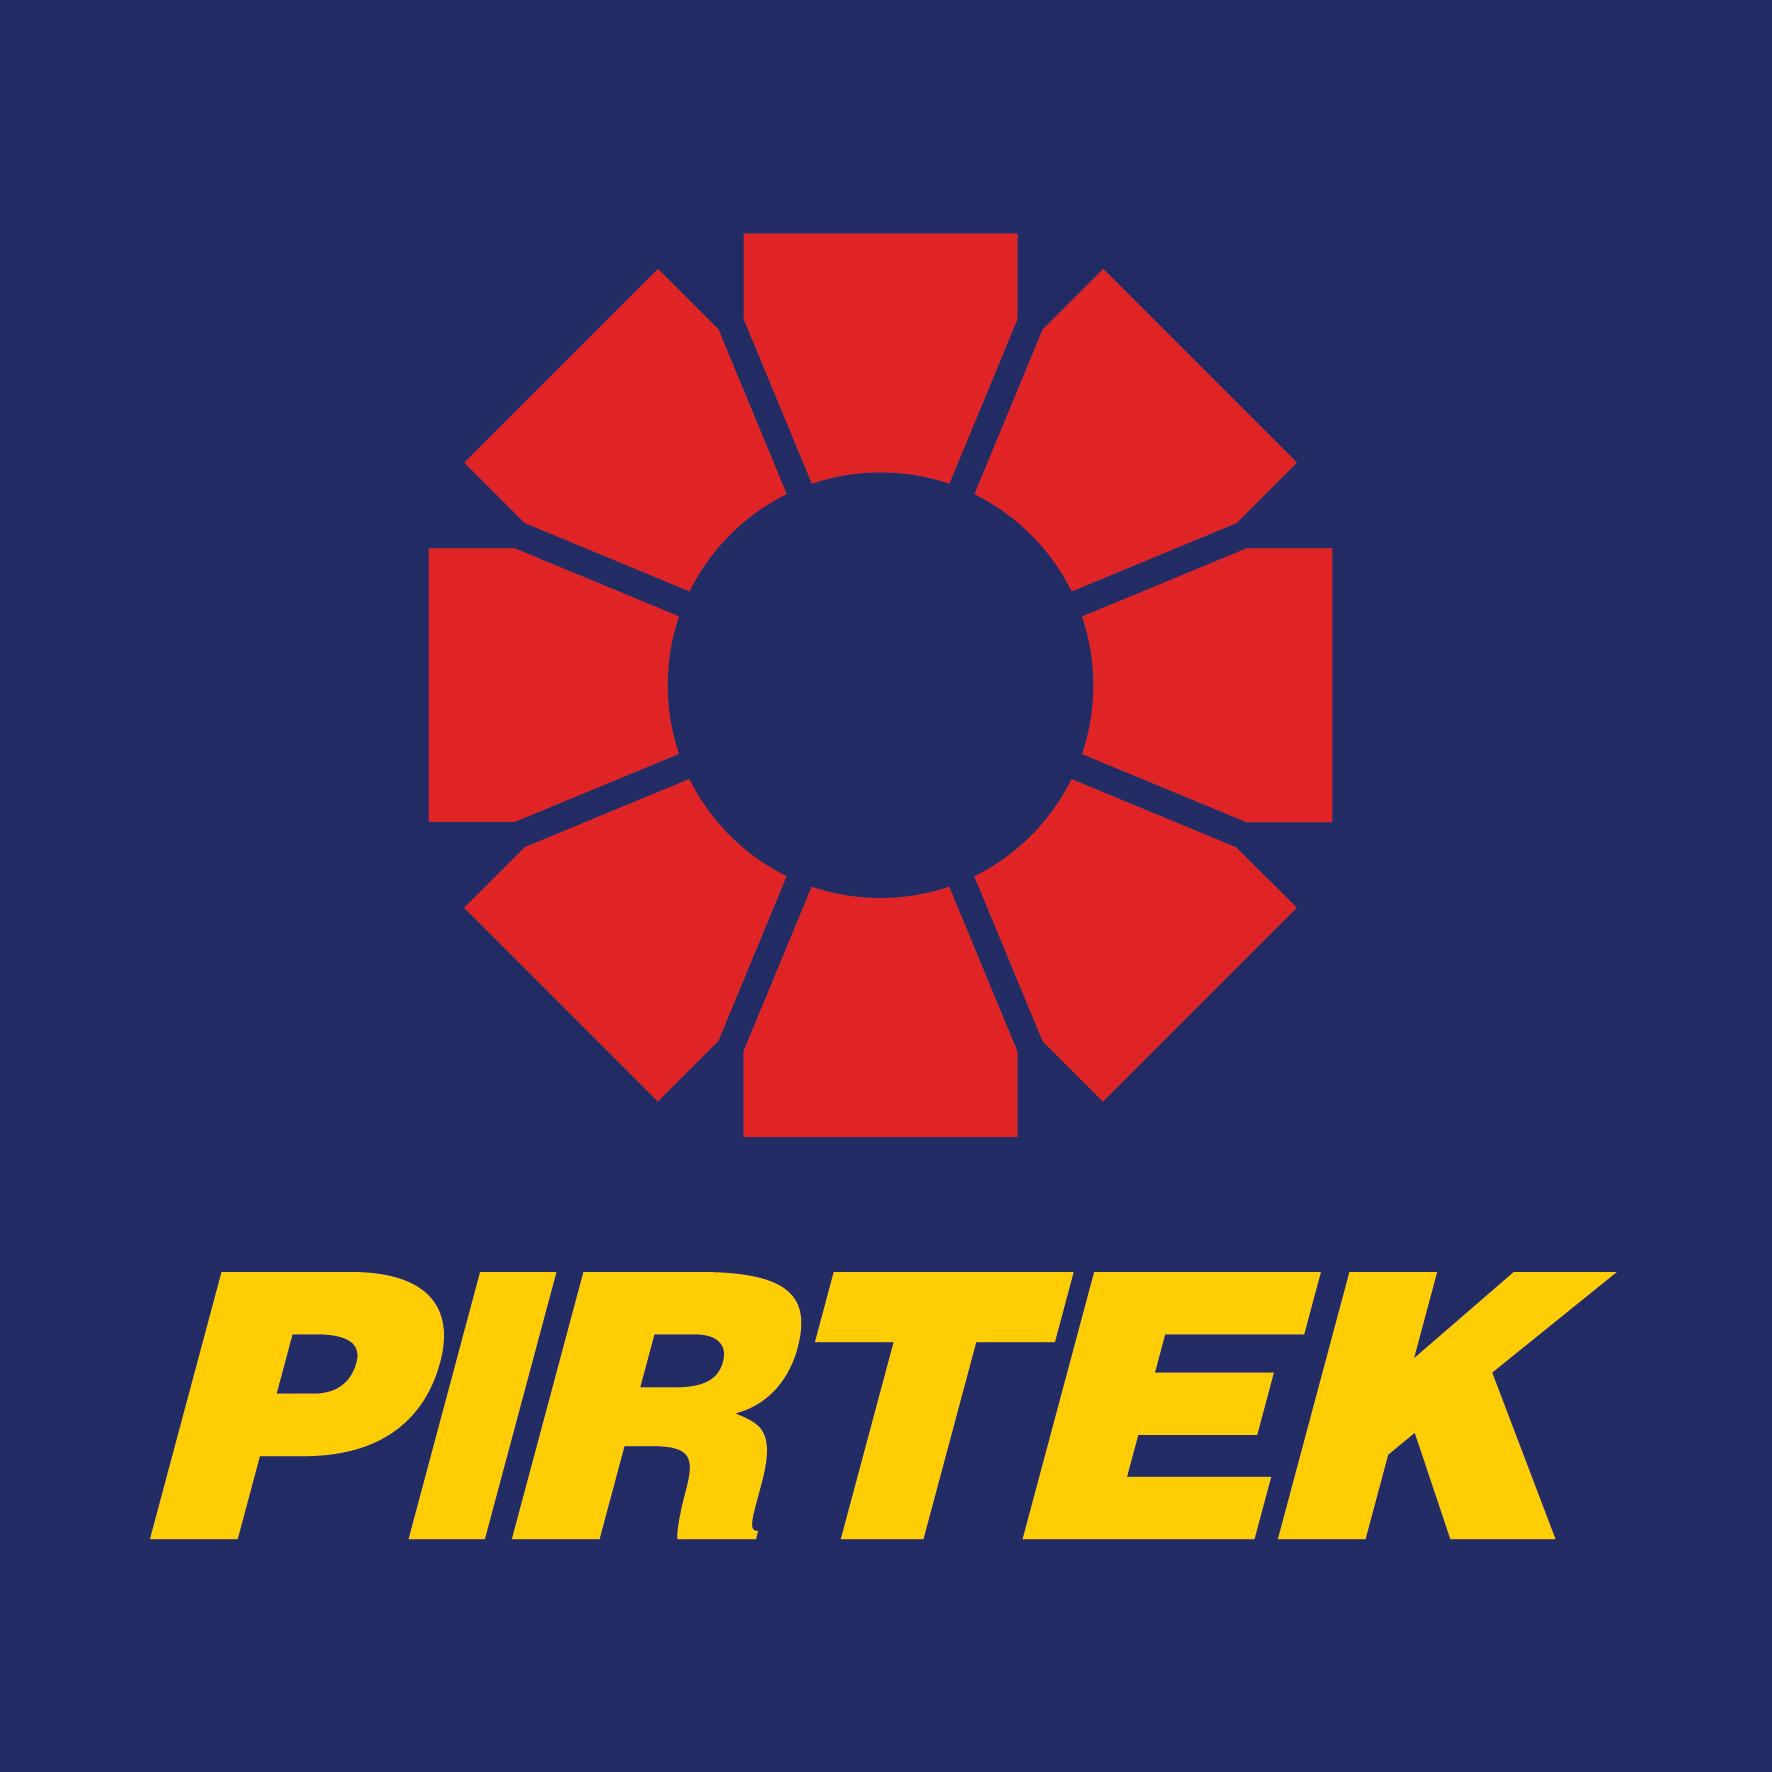 Pirtek Coffs Harbour